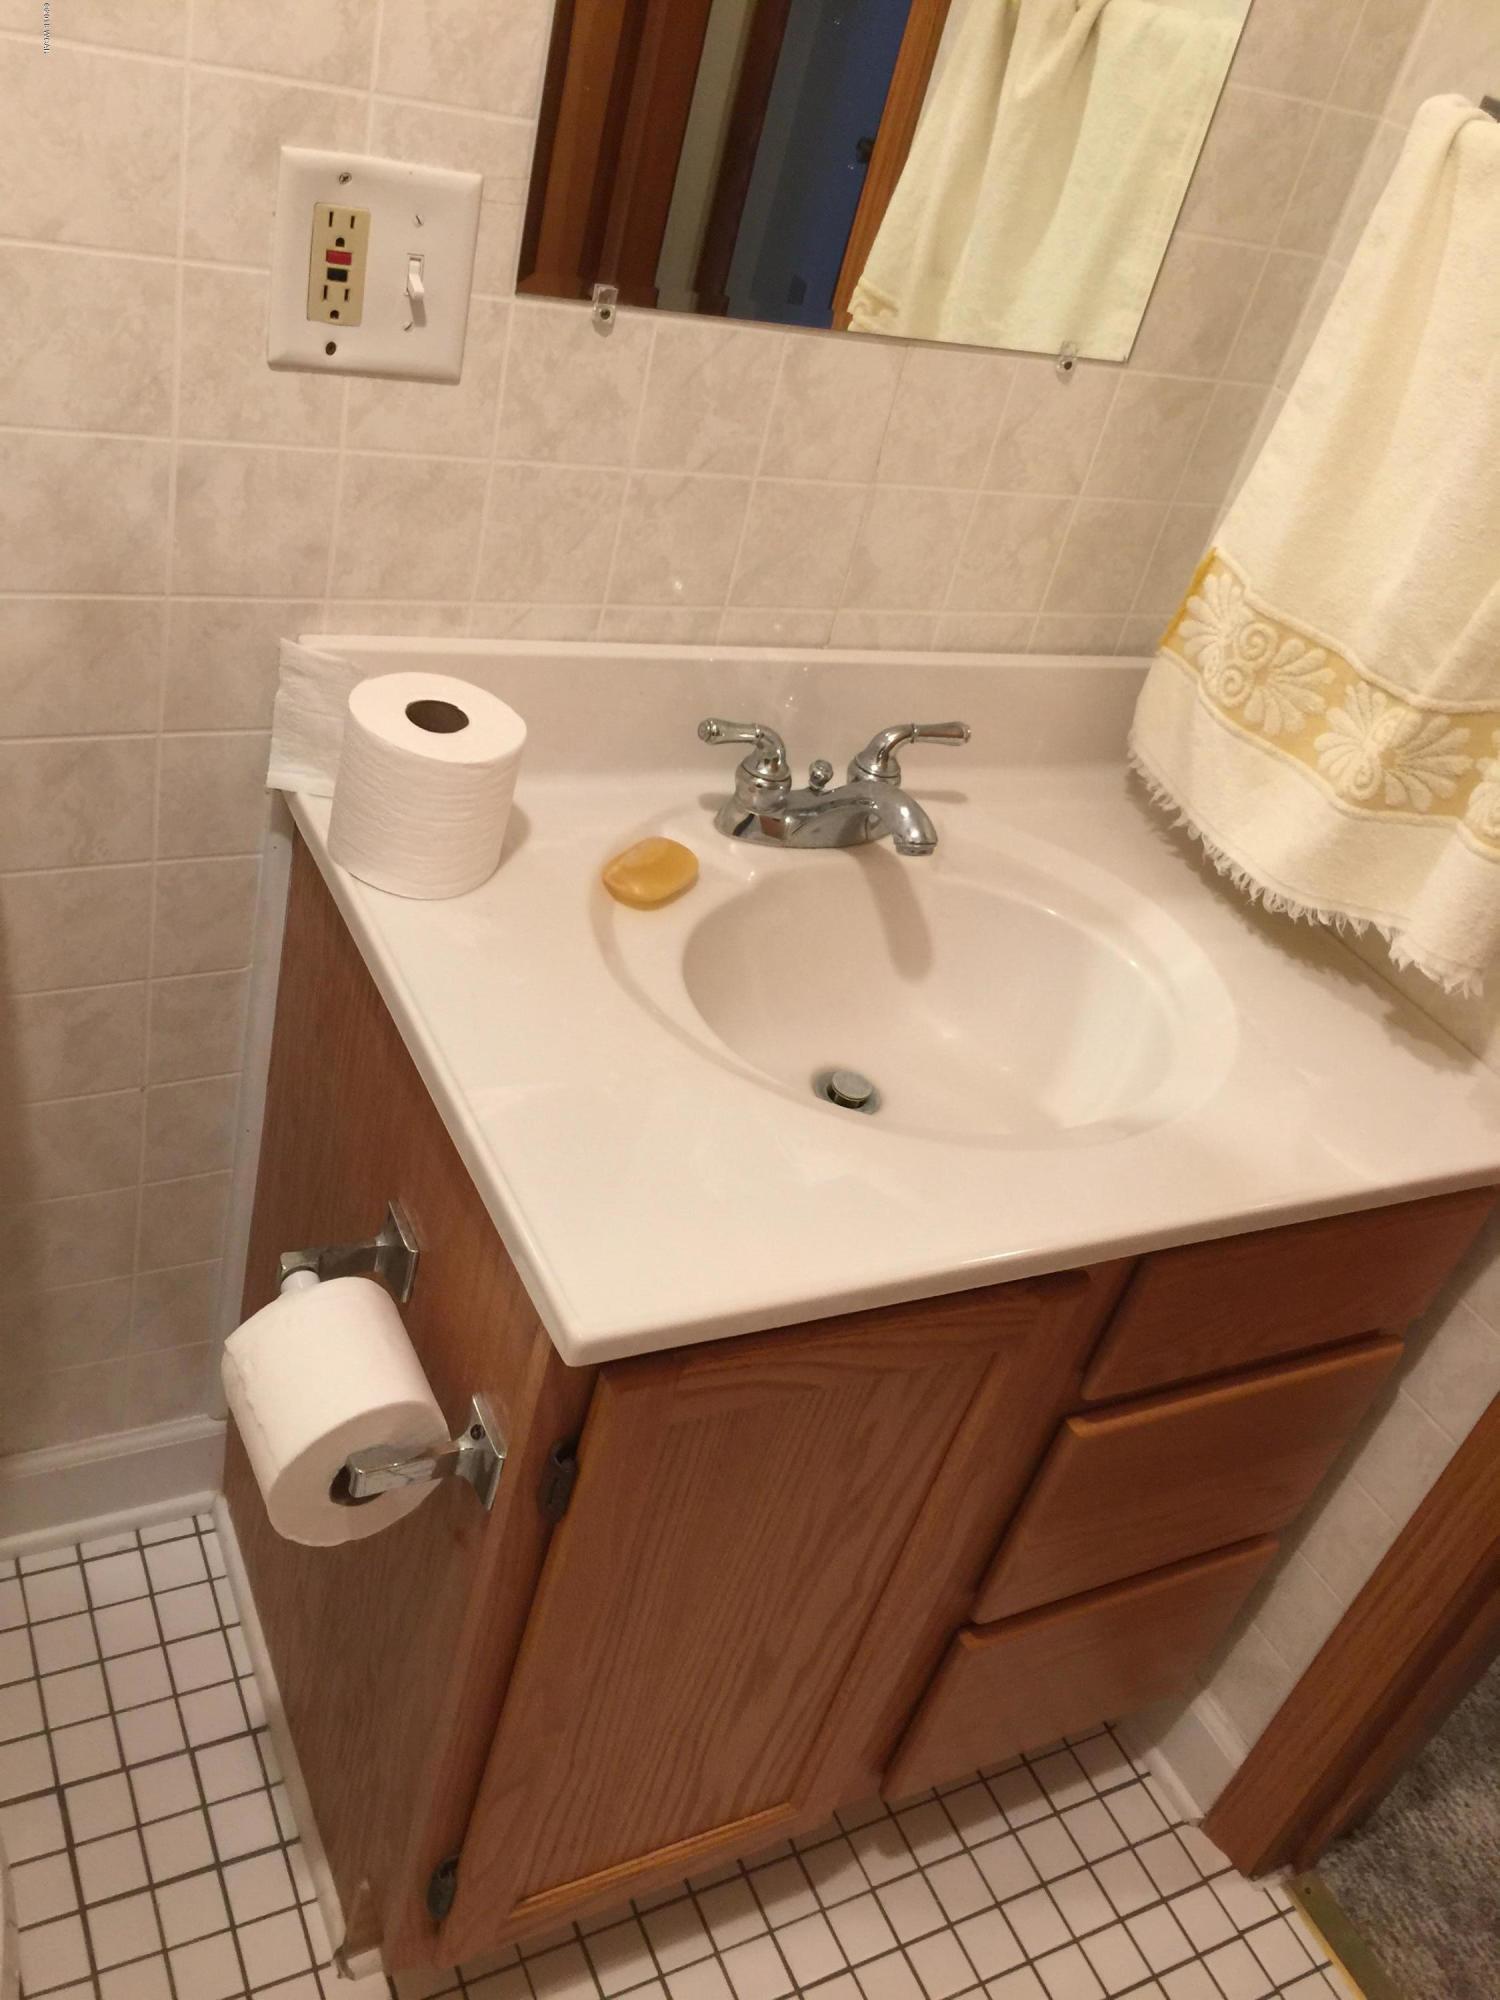 409 13th Street,Kerkhoven,2 Bedrooms Bedrooms,2 BathroomsBathrooms,Single Family,13th Street,6032480